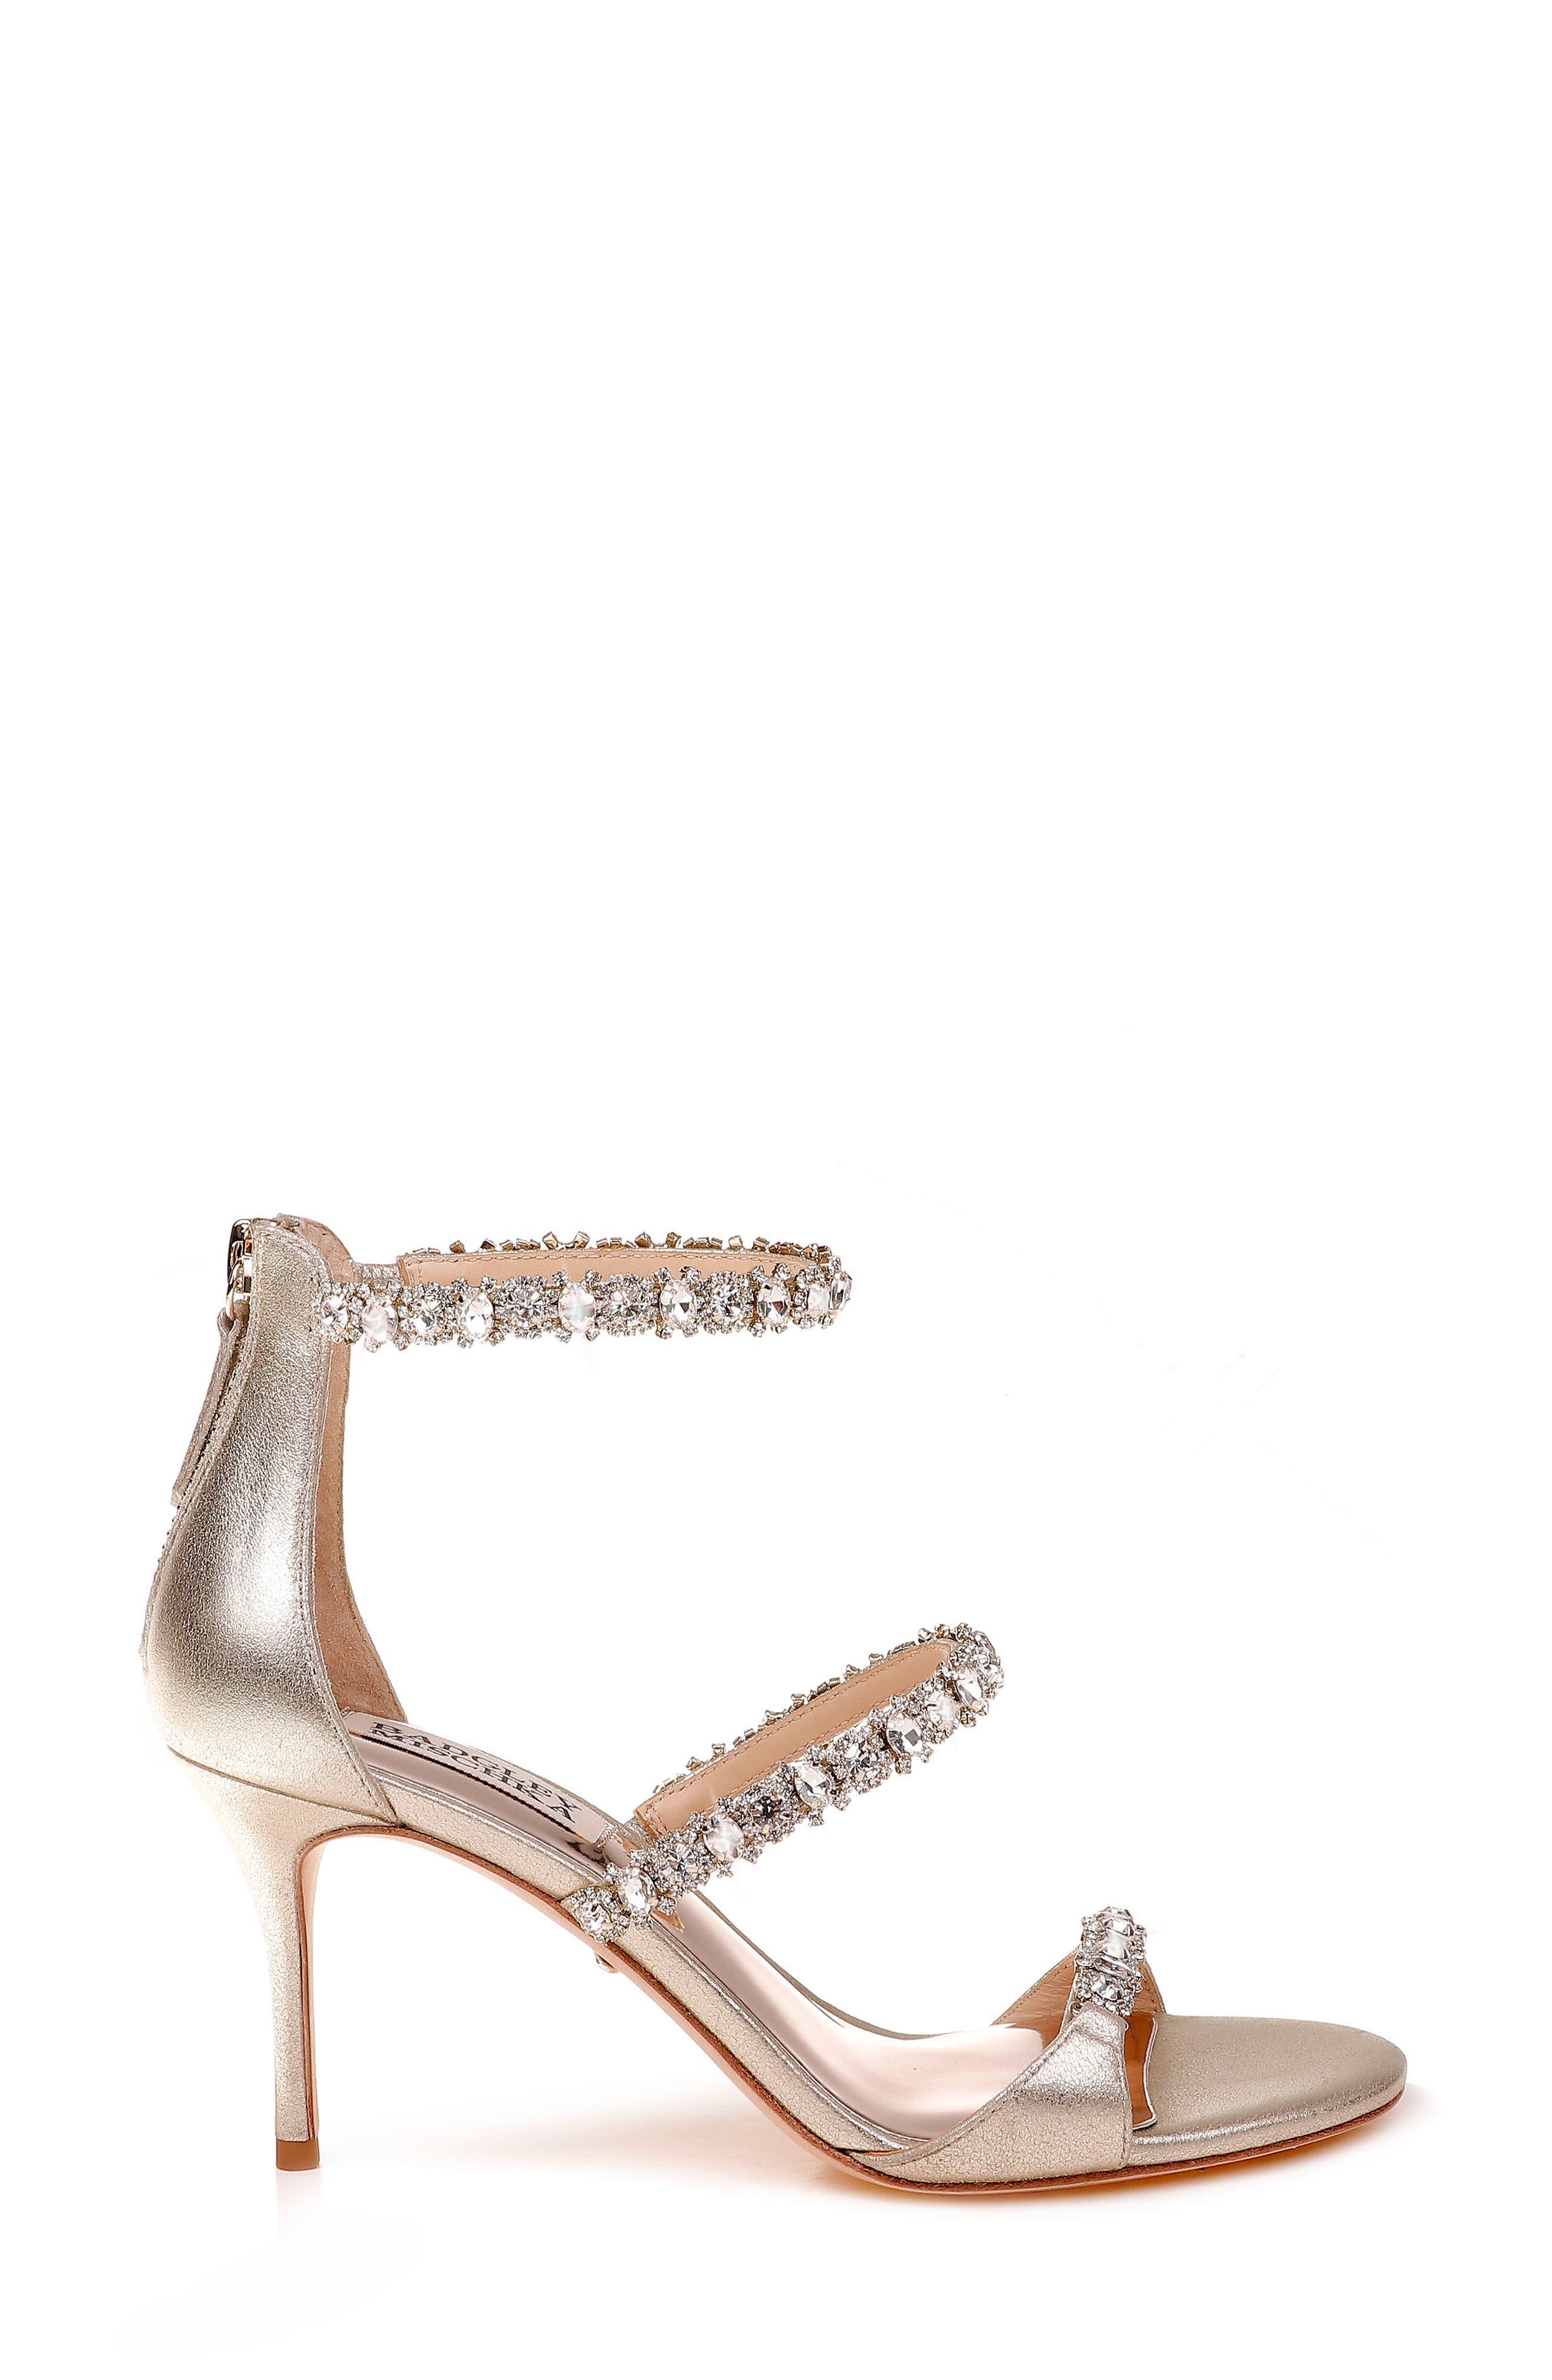 Yasmine Crystal Embellished Sandal,                             Alternate thumbnail 3, color,                             Latte Satin